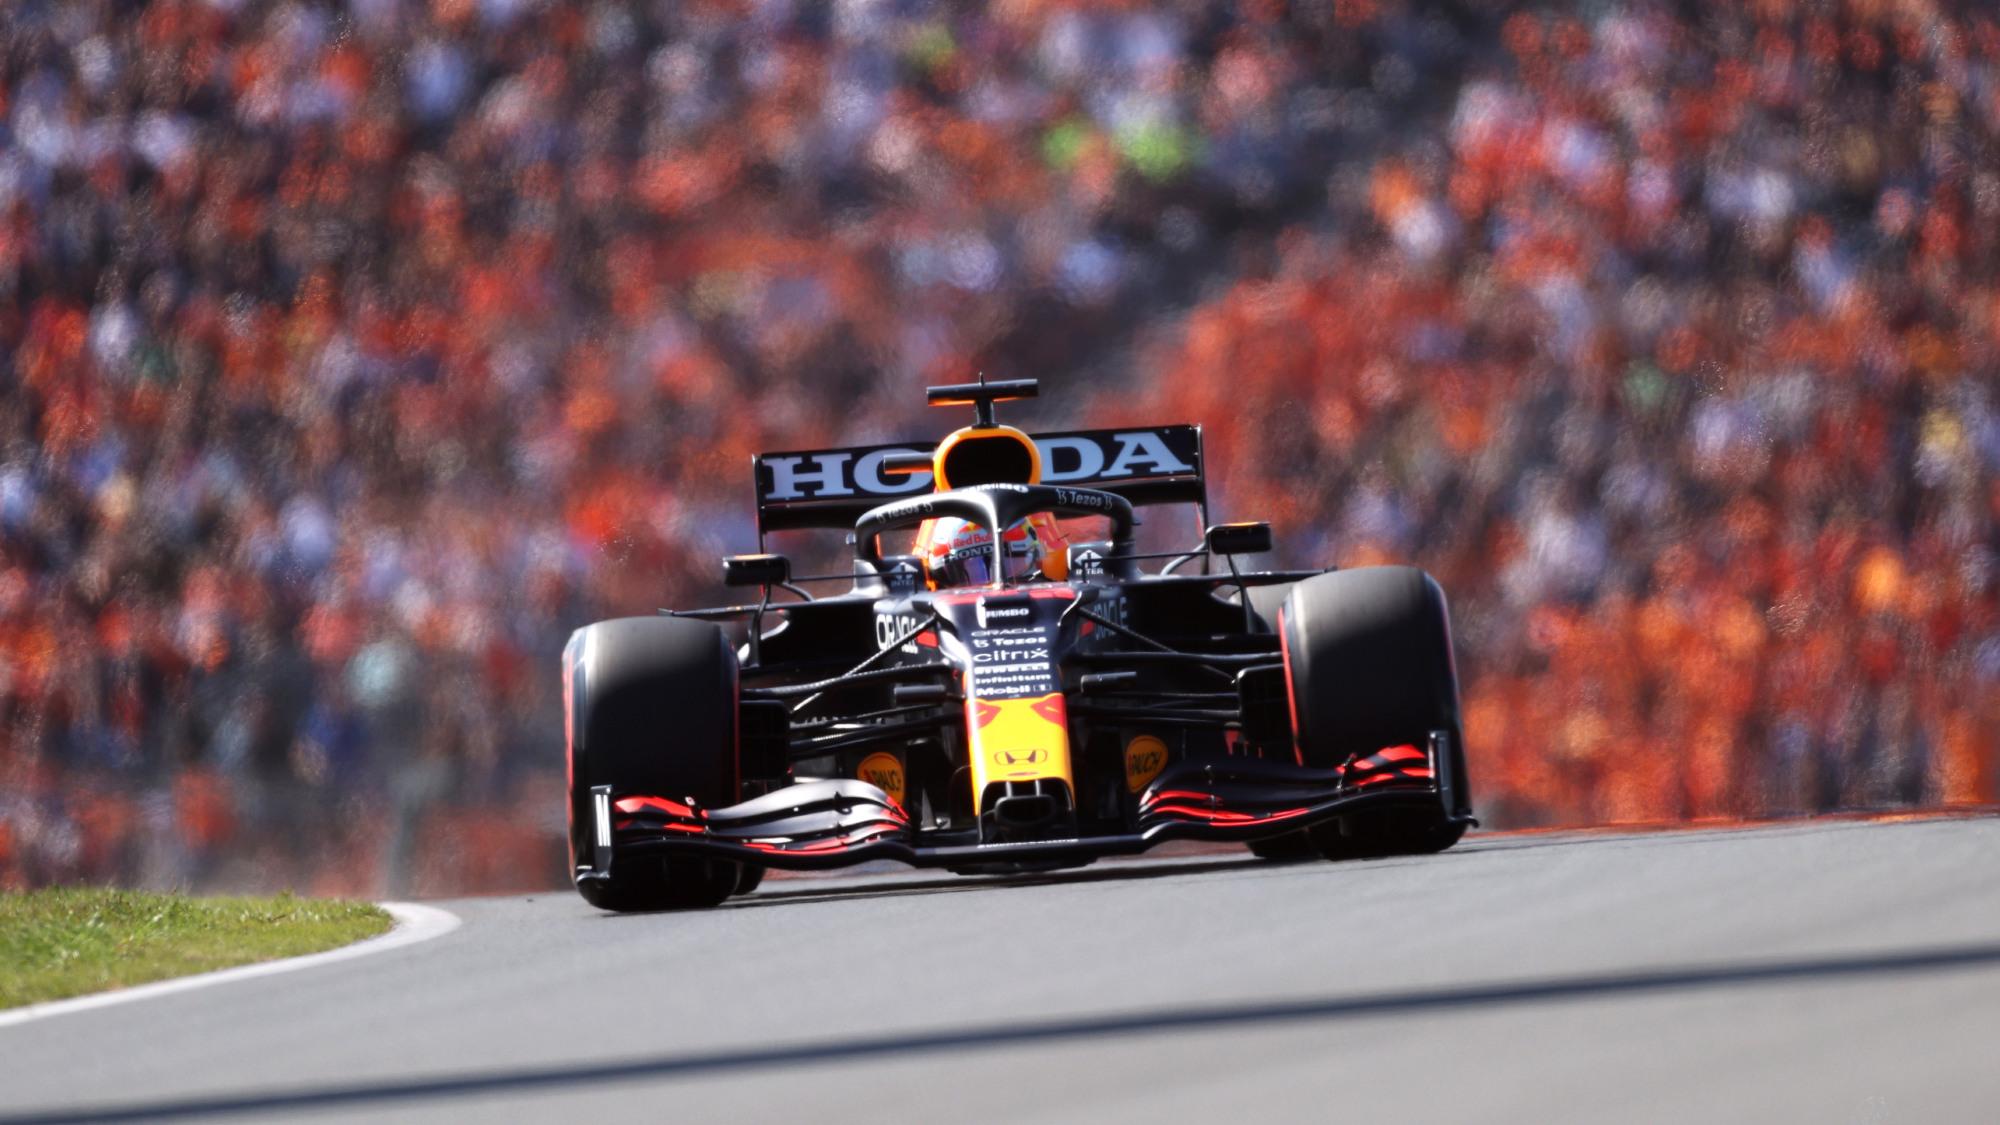 Max Verstappen, 2021 Dutch GP